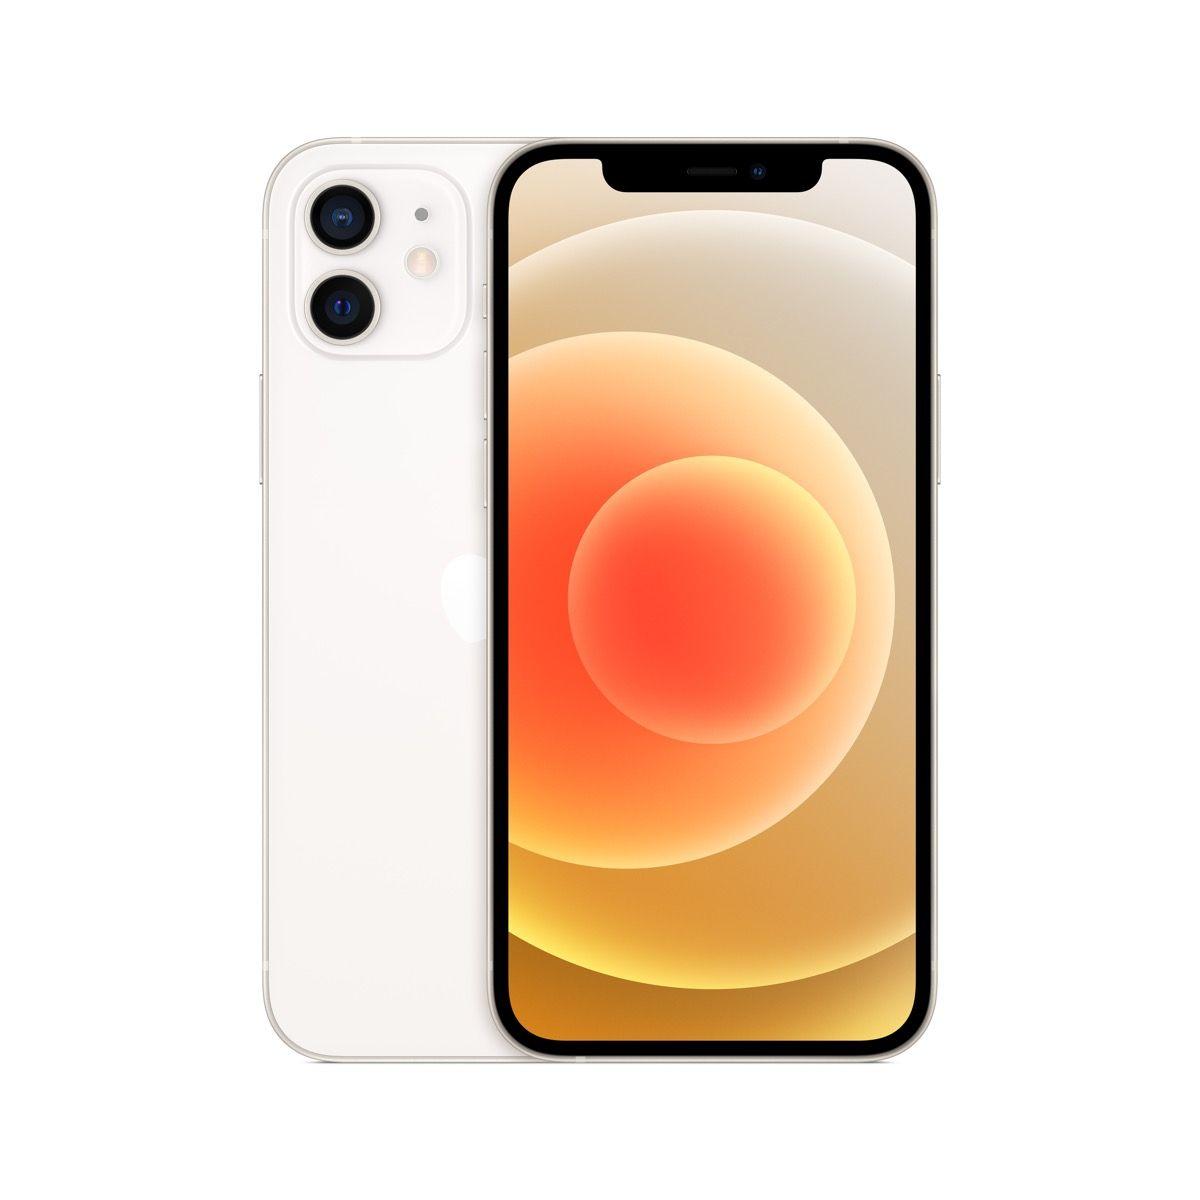 Apple iPhone 12 mini 256GB White / SK